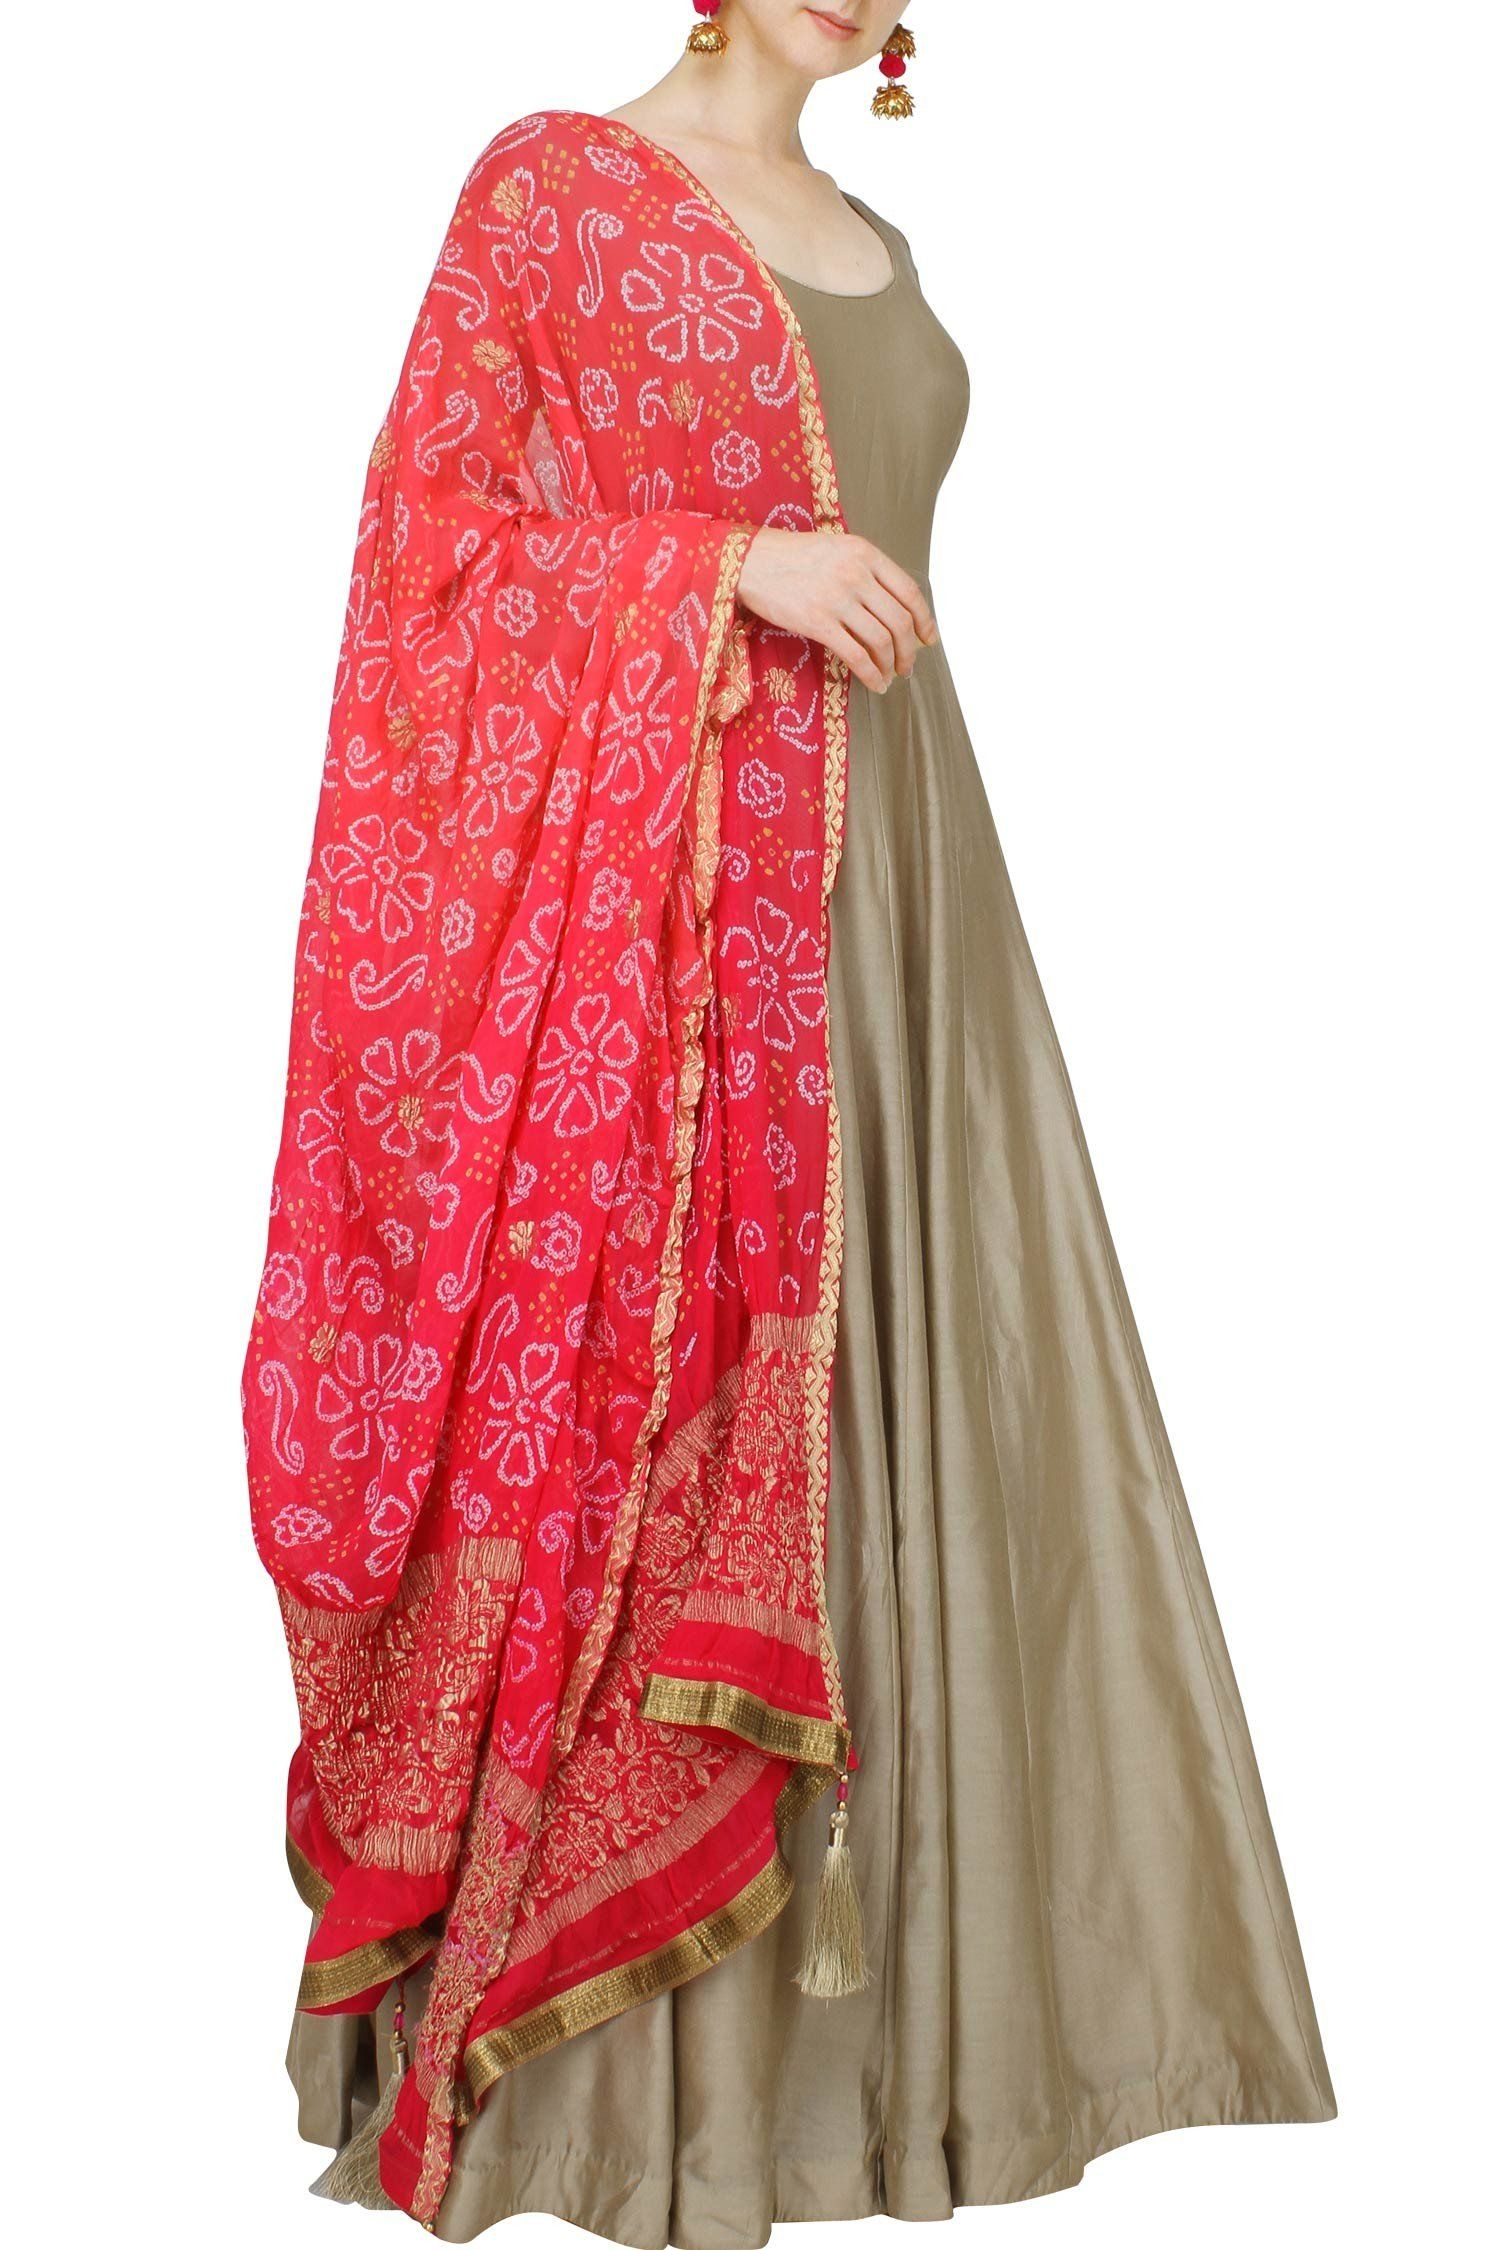 Exclusive Salwar Kameez Unstitch Dress Material Diwali rajasthan bandhani ethnic